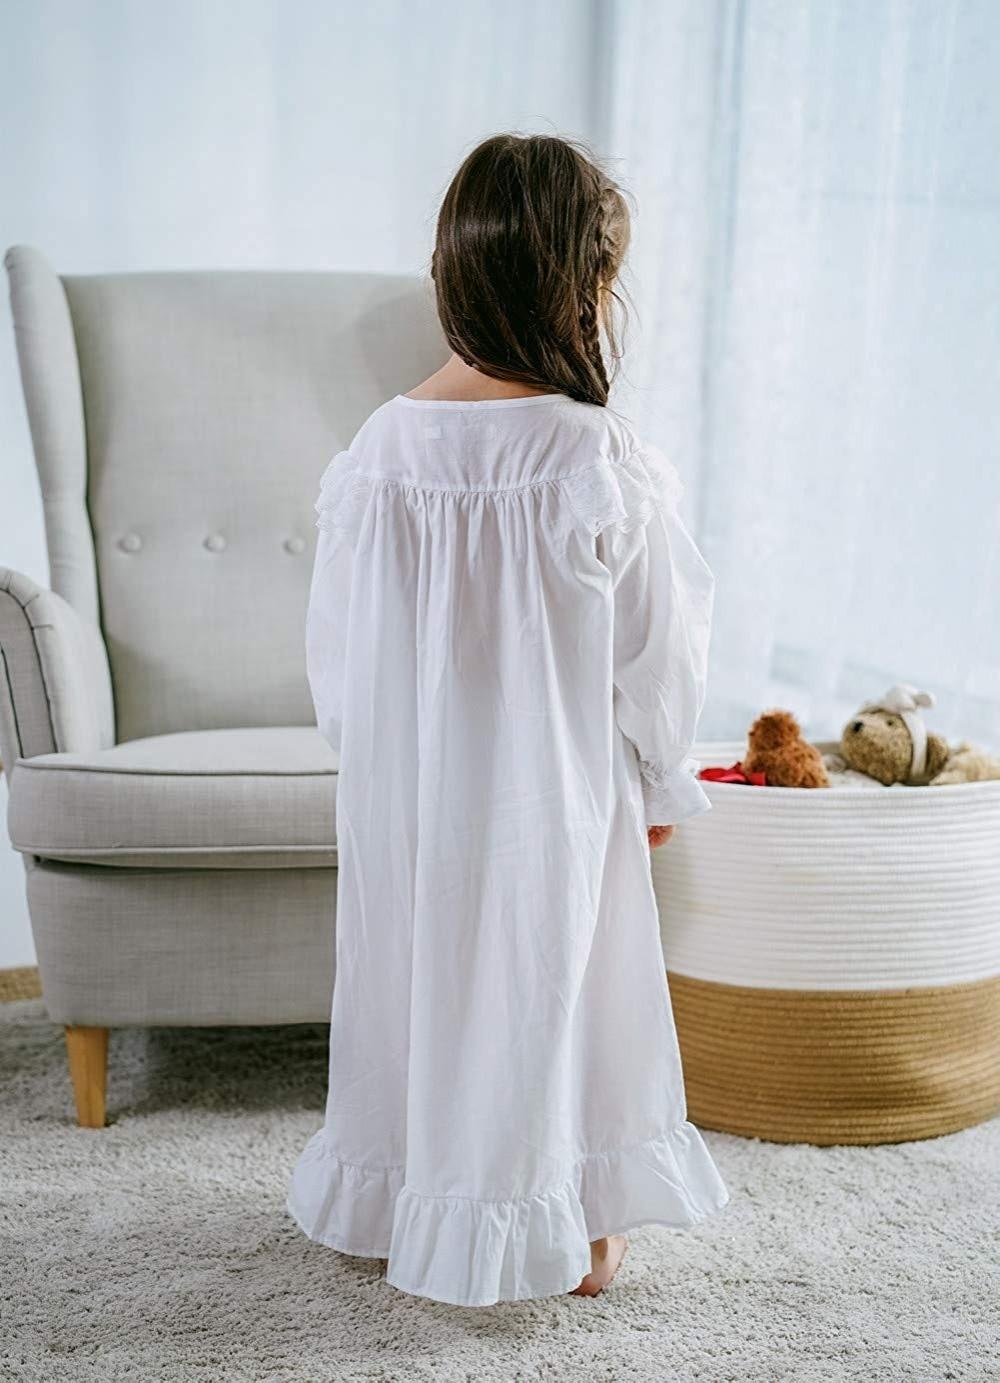 Baby Girl Clothes Princess Nightgown Long Sleeve Sleep Shirts Nightshirts Pajamas Christmas Dress Sleepwear kids for 3-12 Years (5)